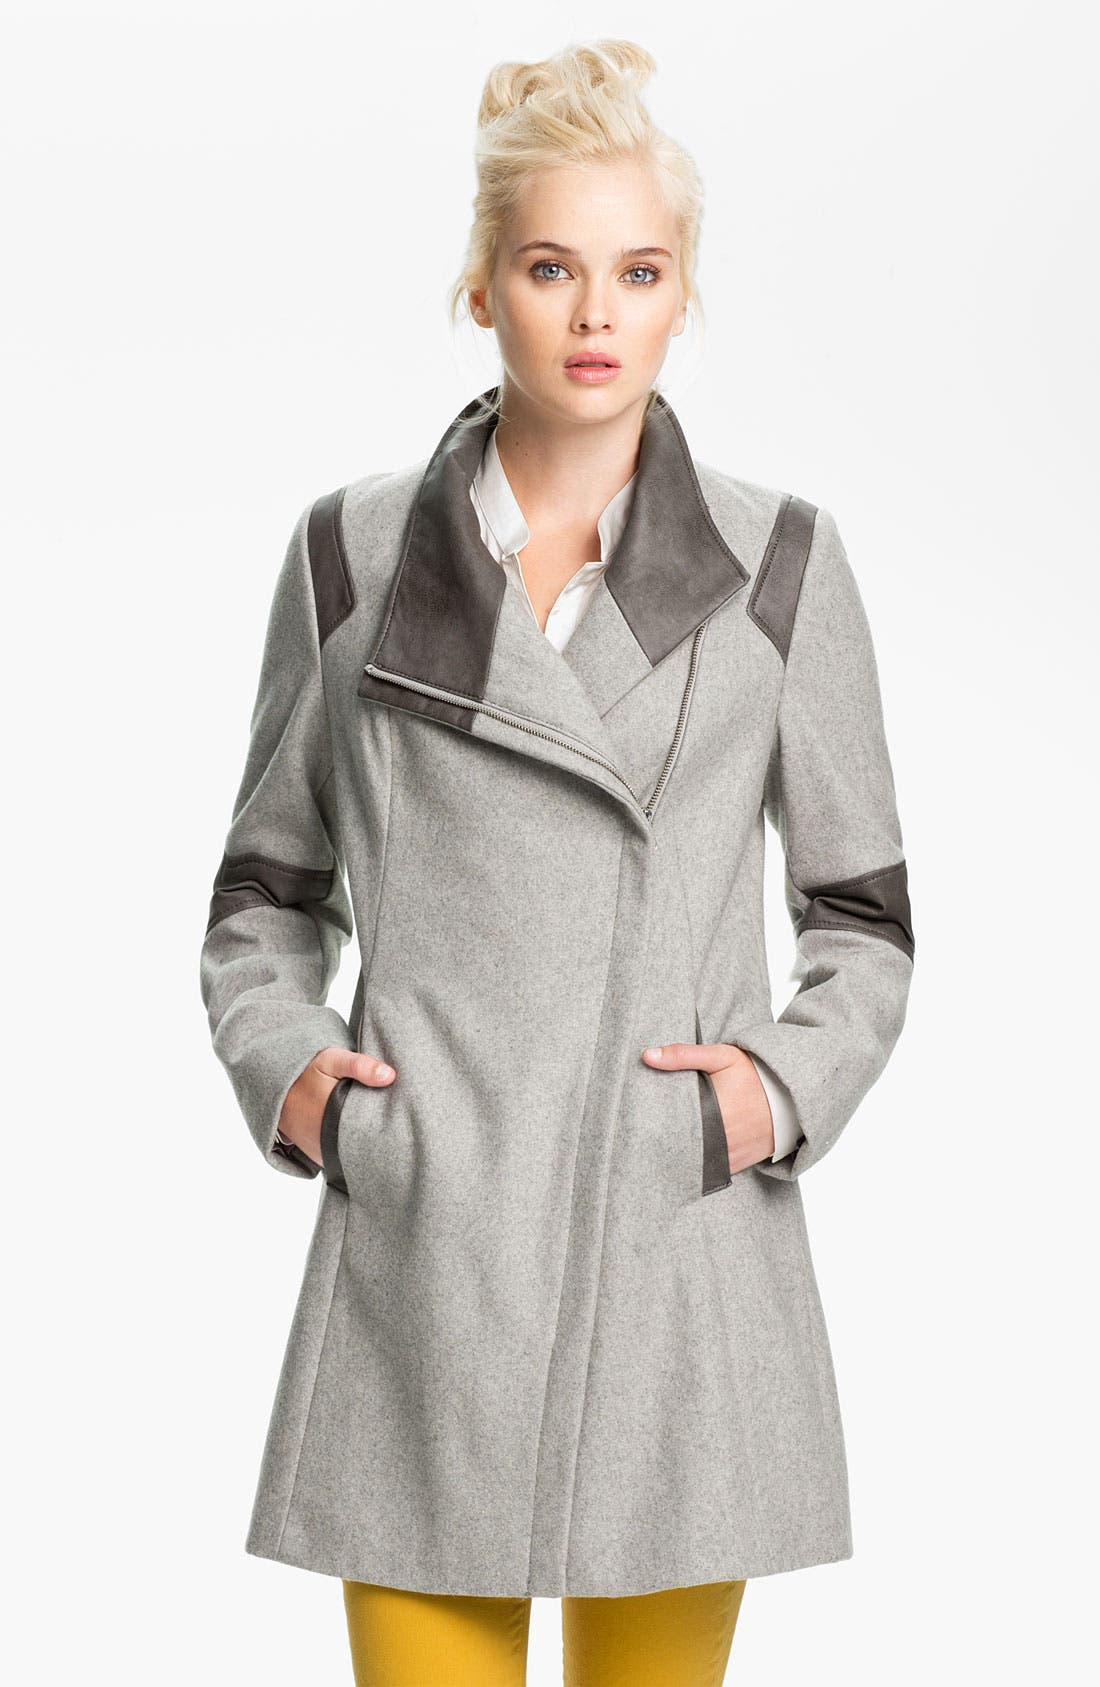 Alternate Image 1 Selected - Calvin Klein Faux Leather Trim Walking Coat